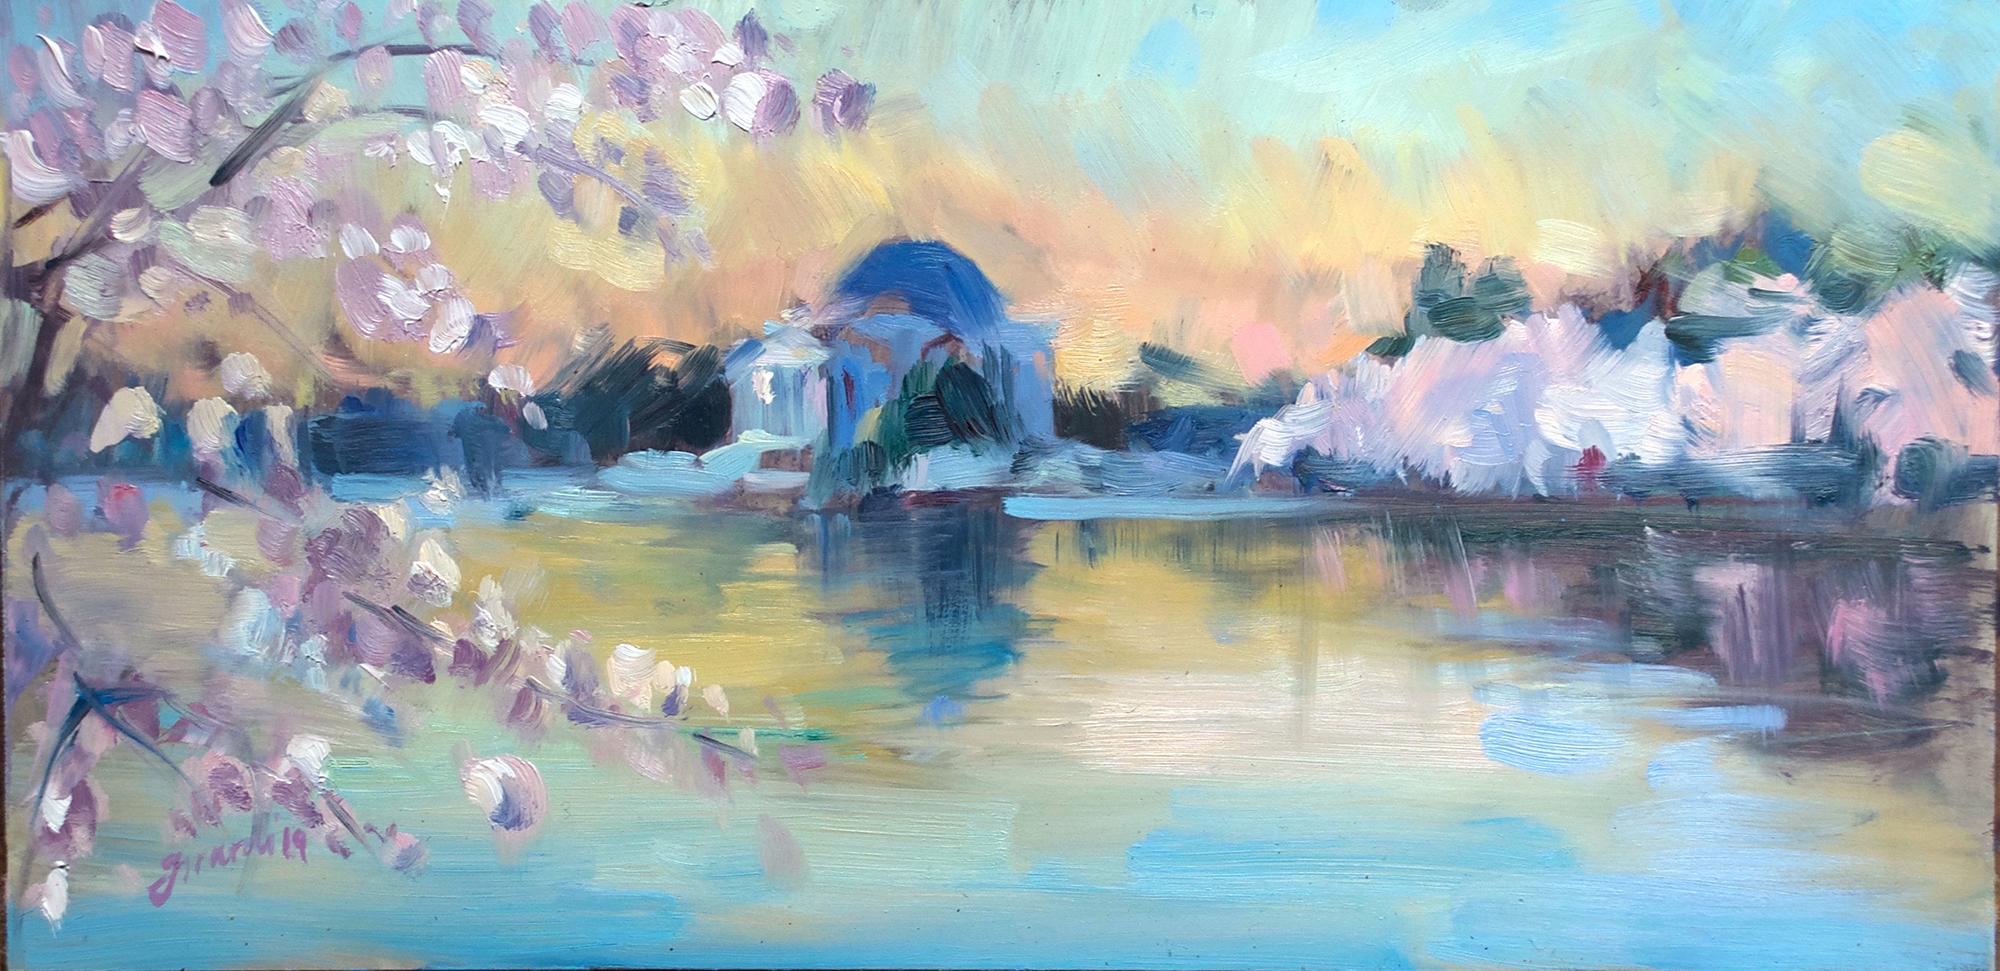 Sunrise at Peak Bloom, DC Cherry Blossoms 2019